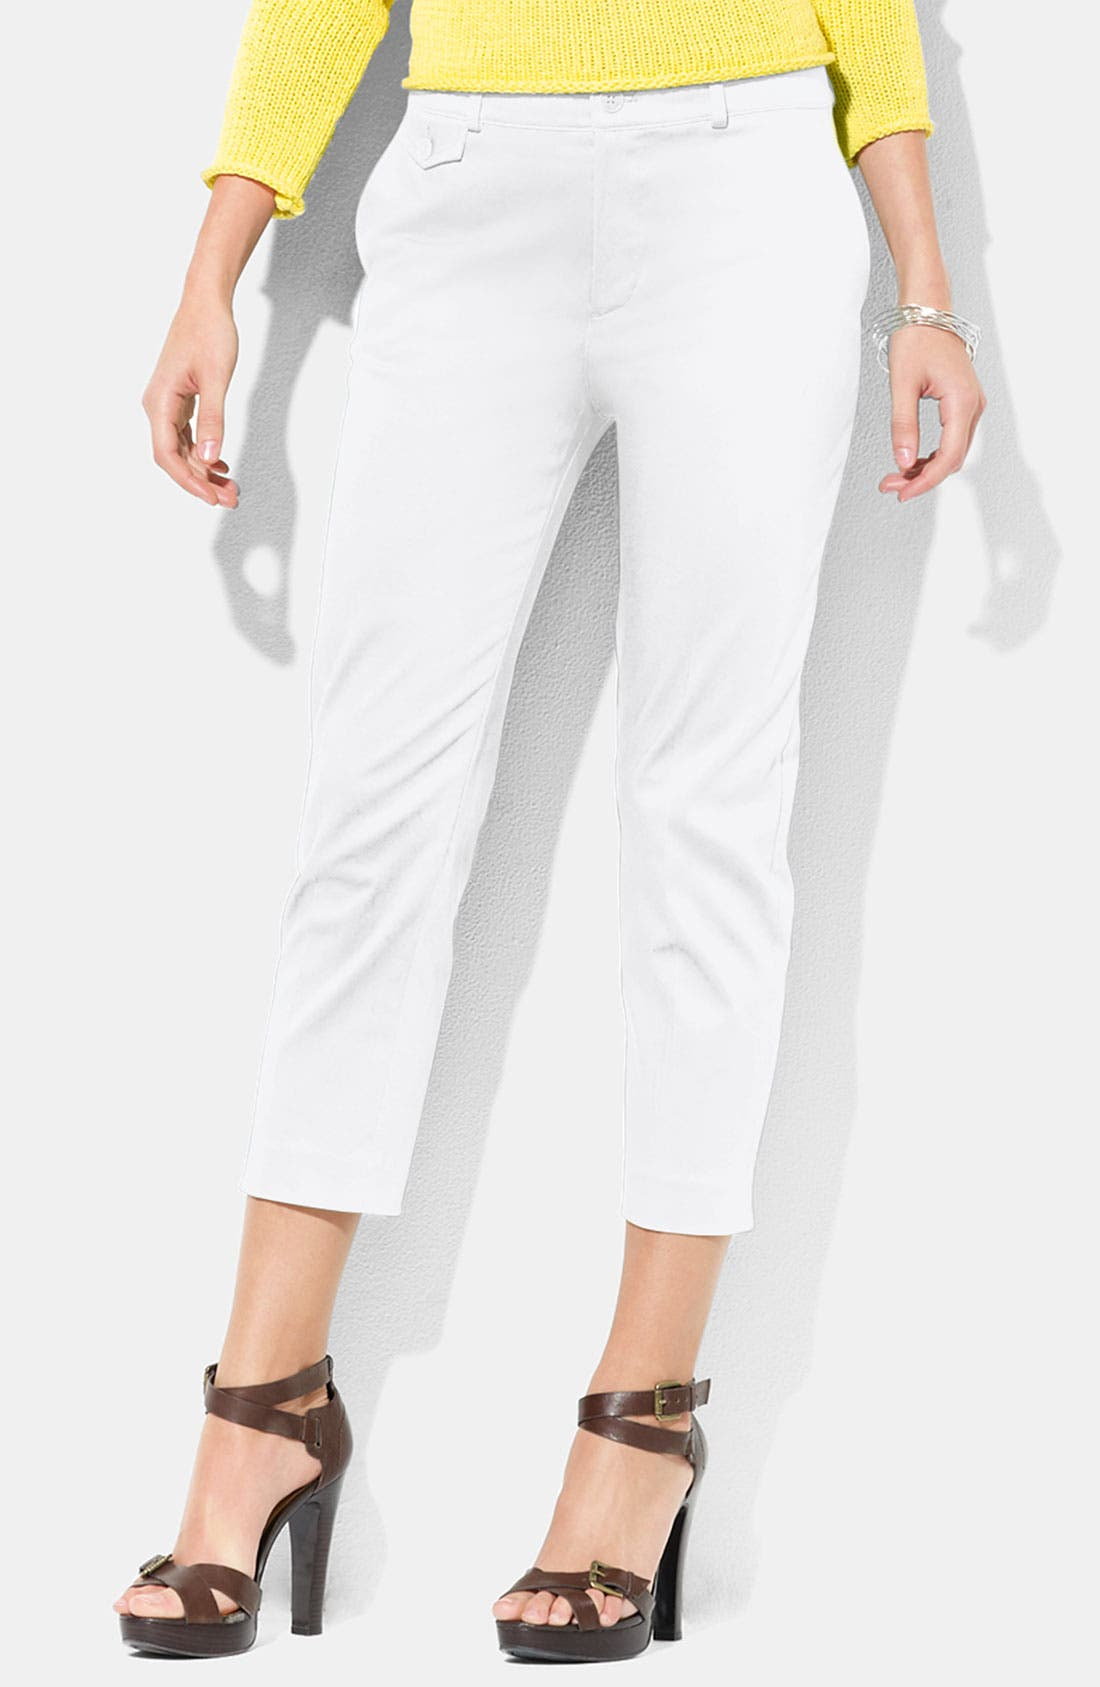 Alternate Image 1 Selected - Lauren Ralph Lauren 'Jodie' Slim Fit Crop Pants (Petite)